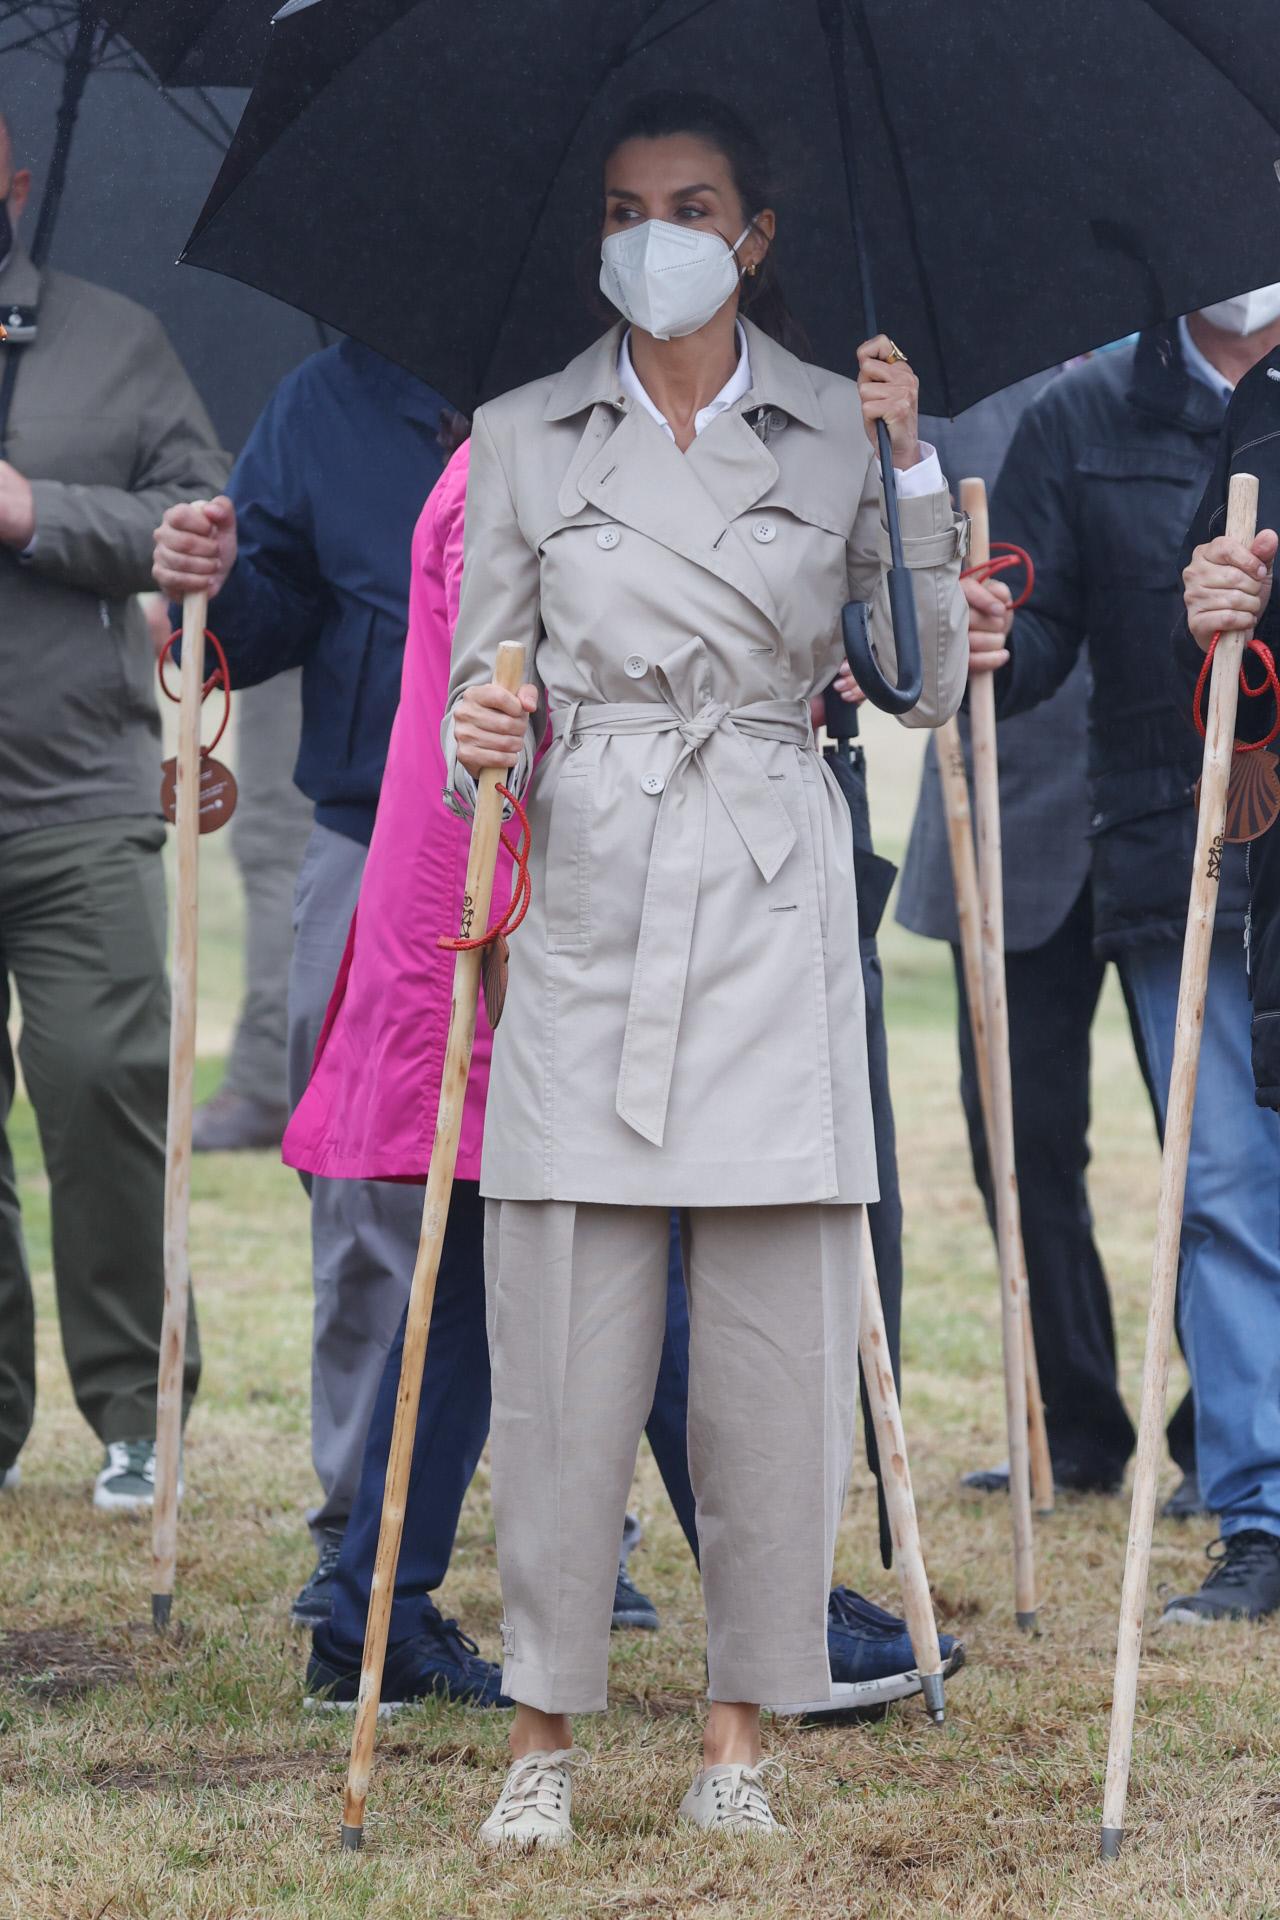 La reina Letizia con trench bajo la lluvia de Roncesvalles.